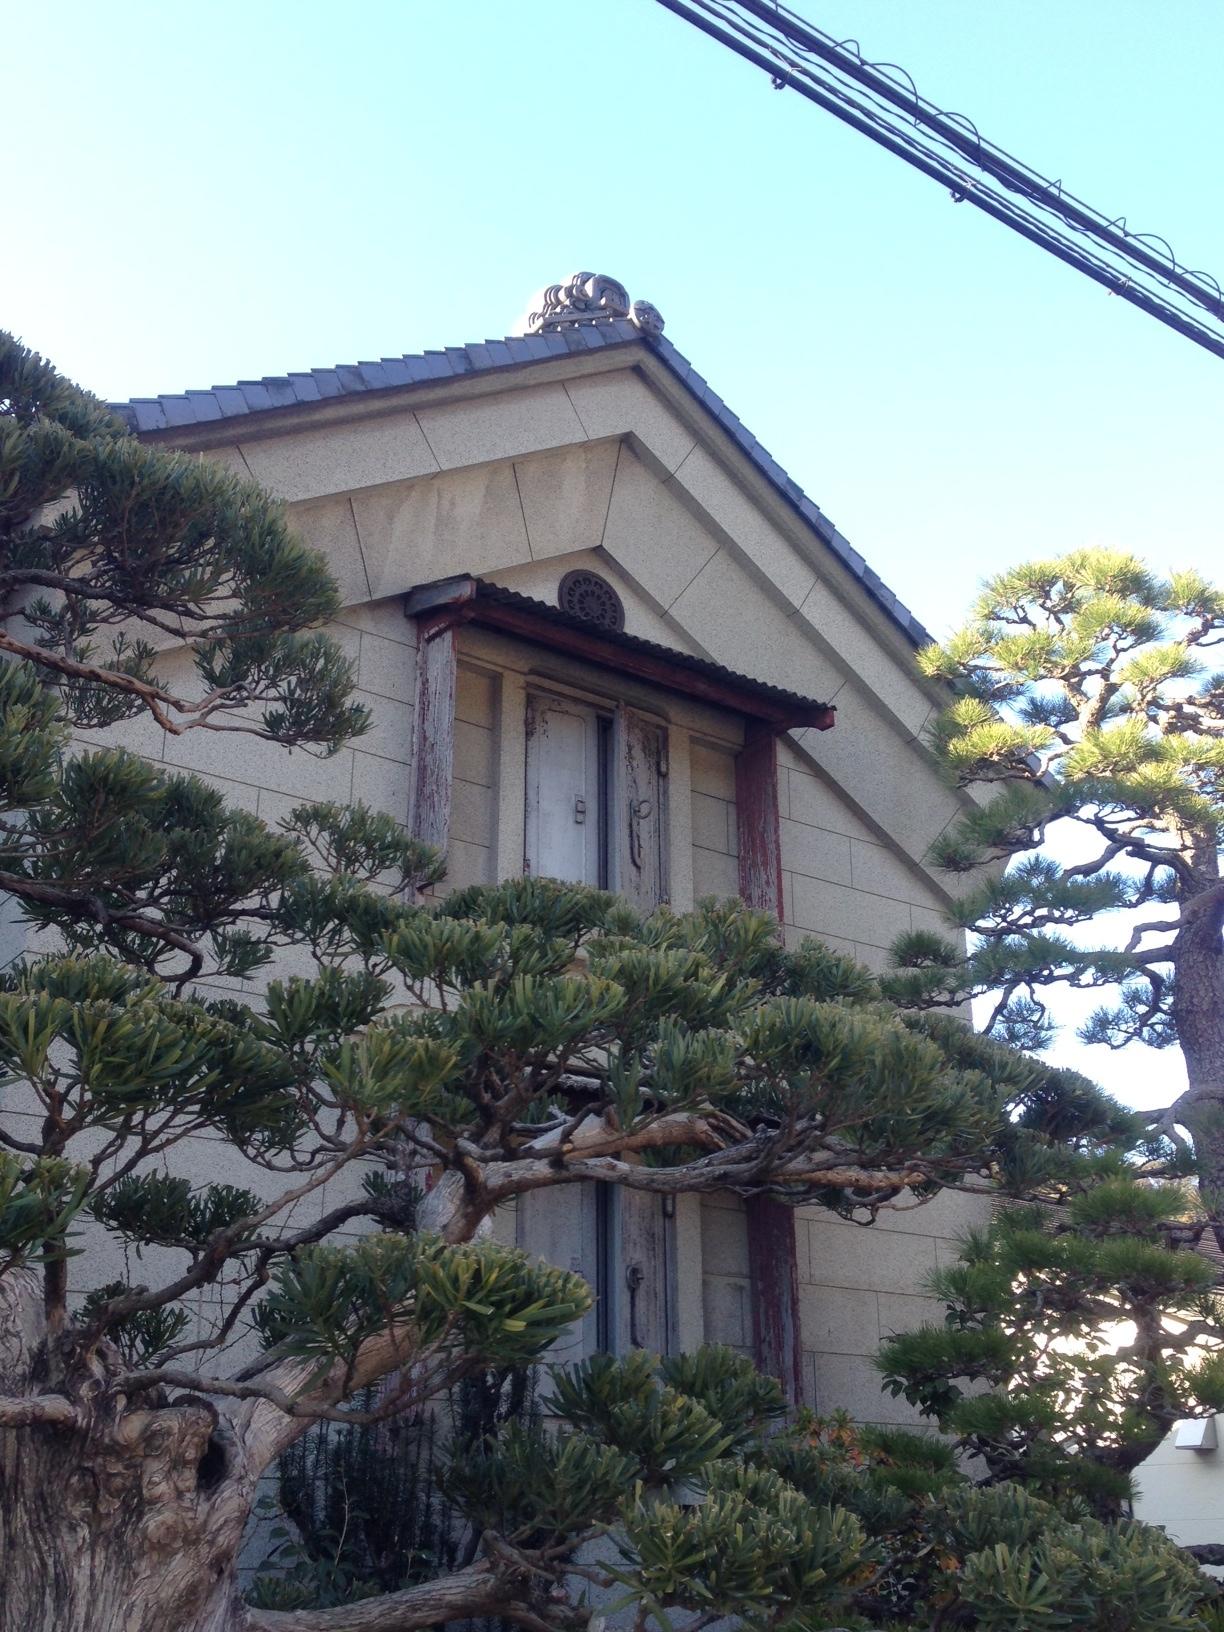 OKABE-9-warehouse-and-pine-trees